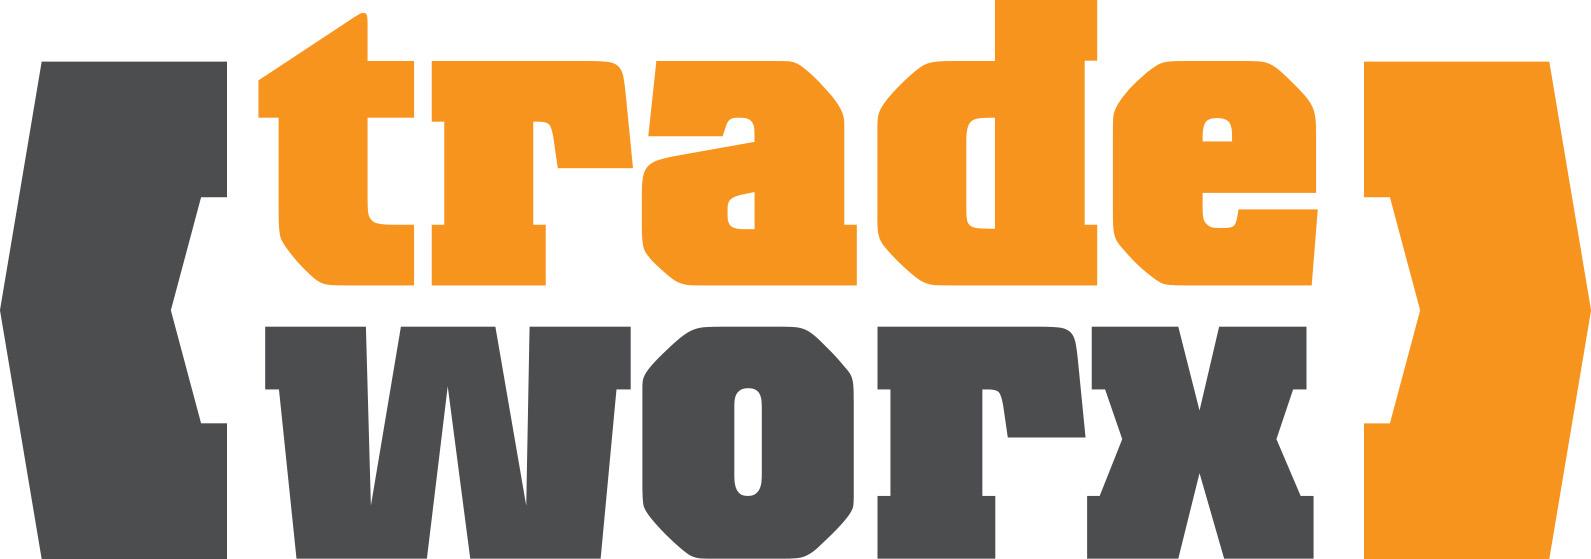 Tradeworx